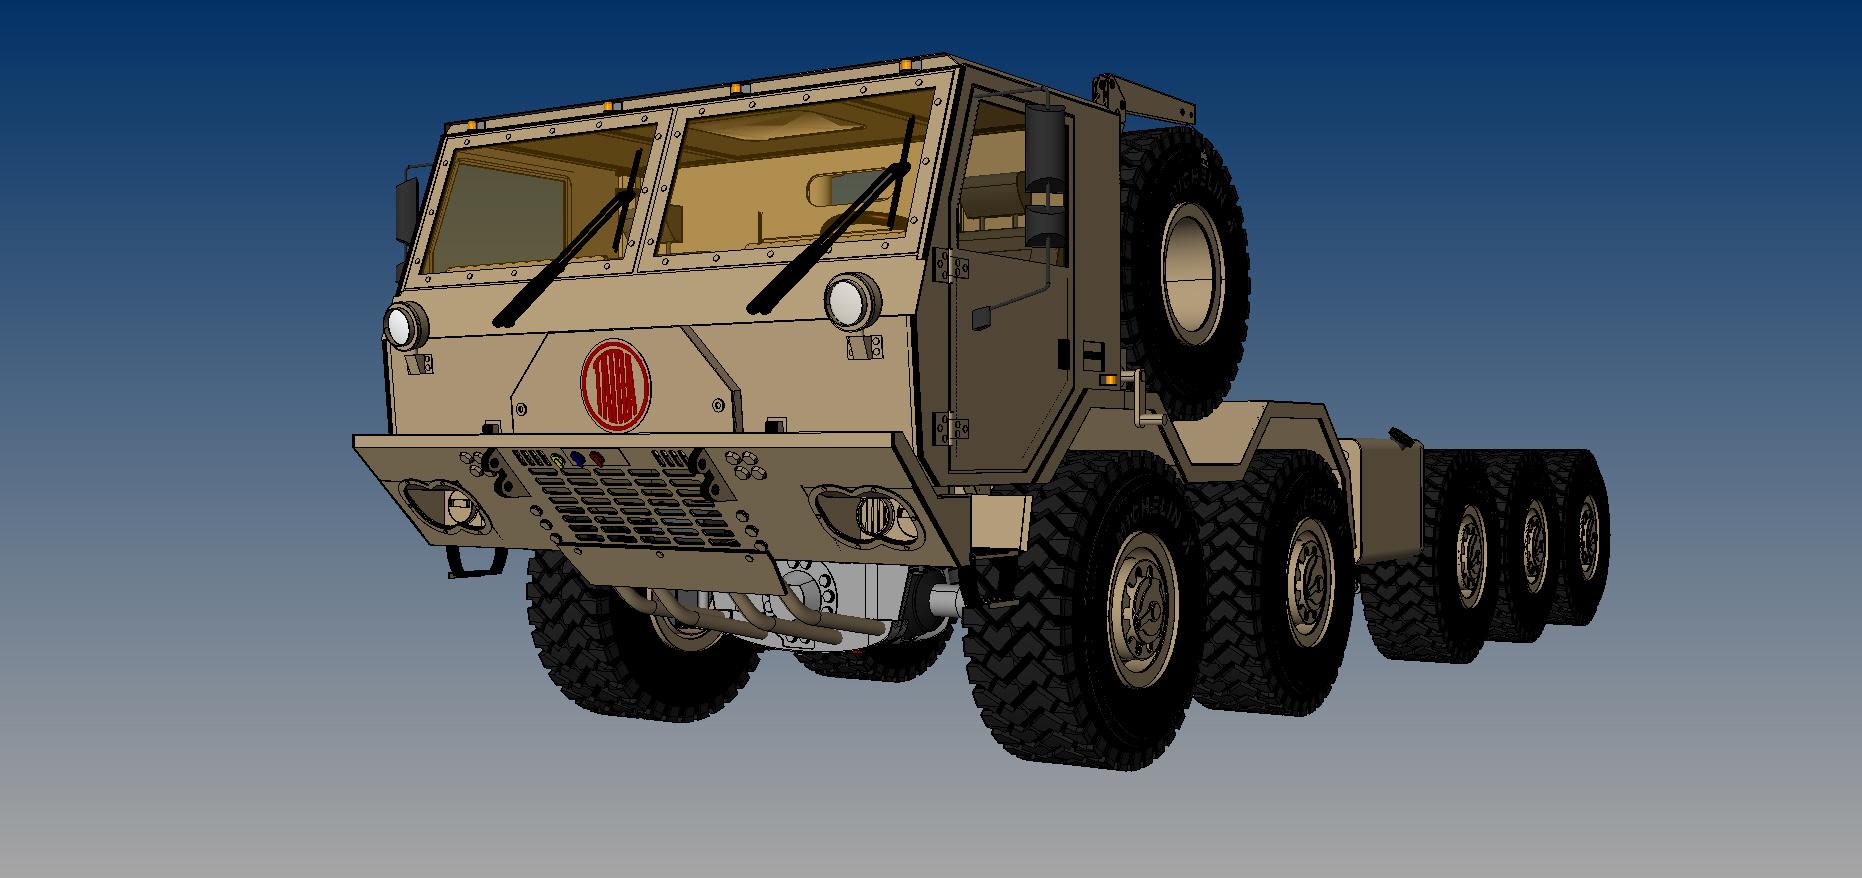 tatra 815-7 10×10 chasis 3d model 3dm 115320